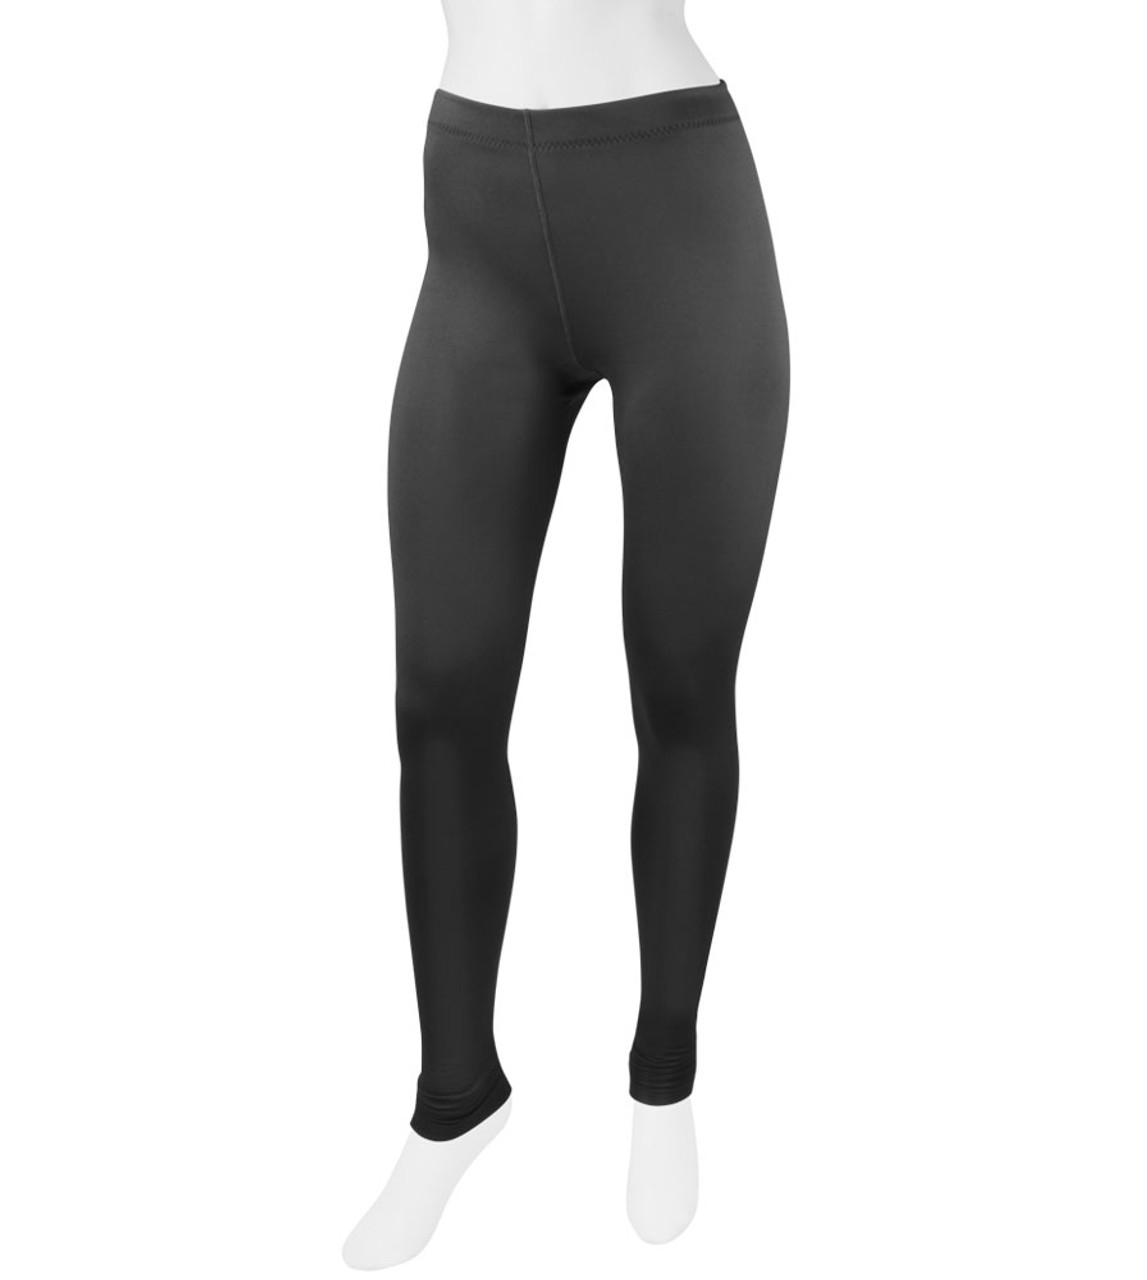 de807d7be7cf6 Women's Black Stretch Fleece Workout Legging Tights - Made in USA